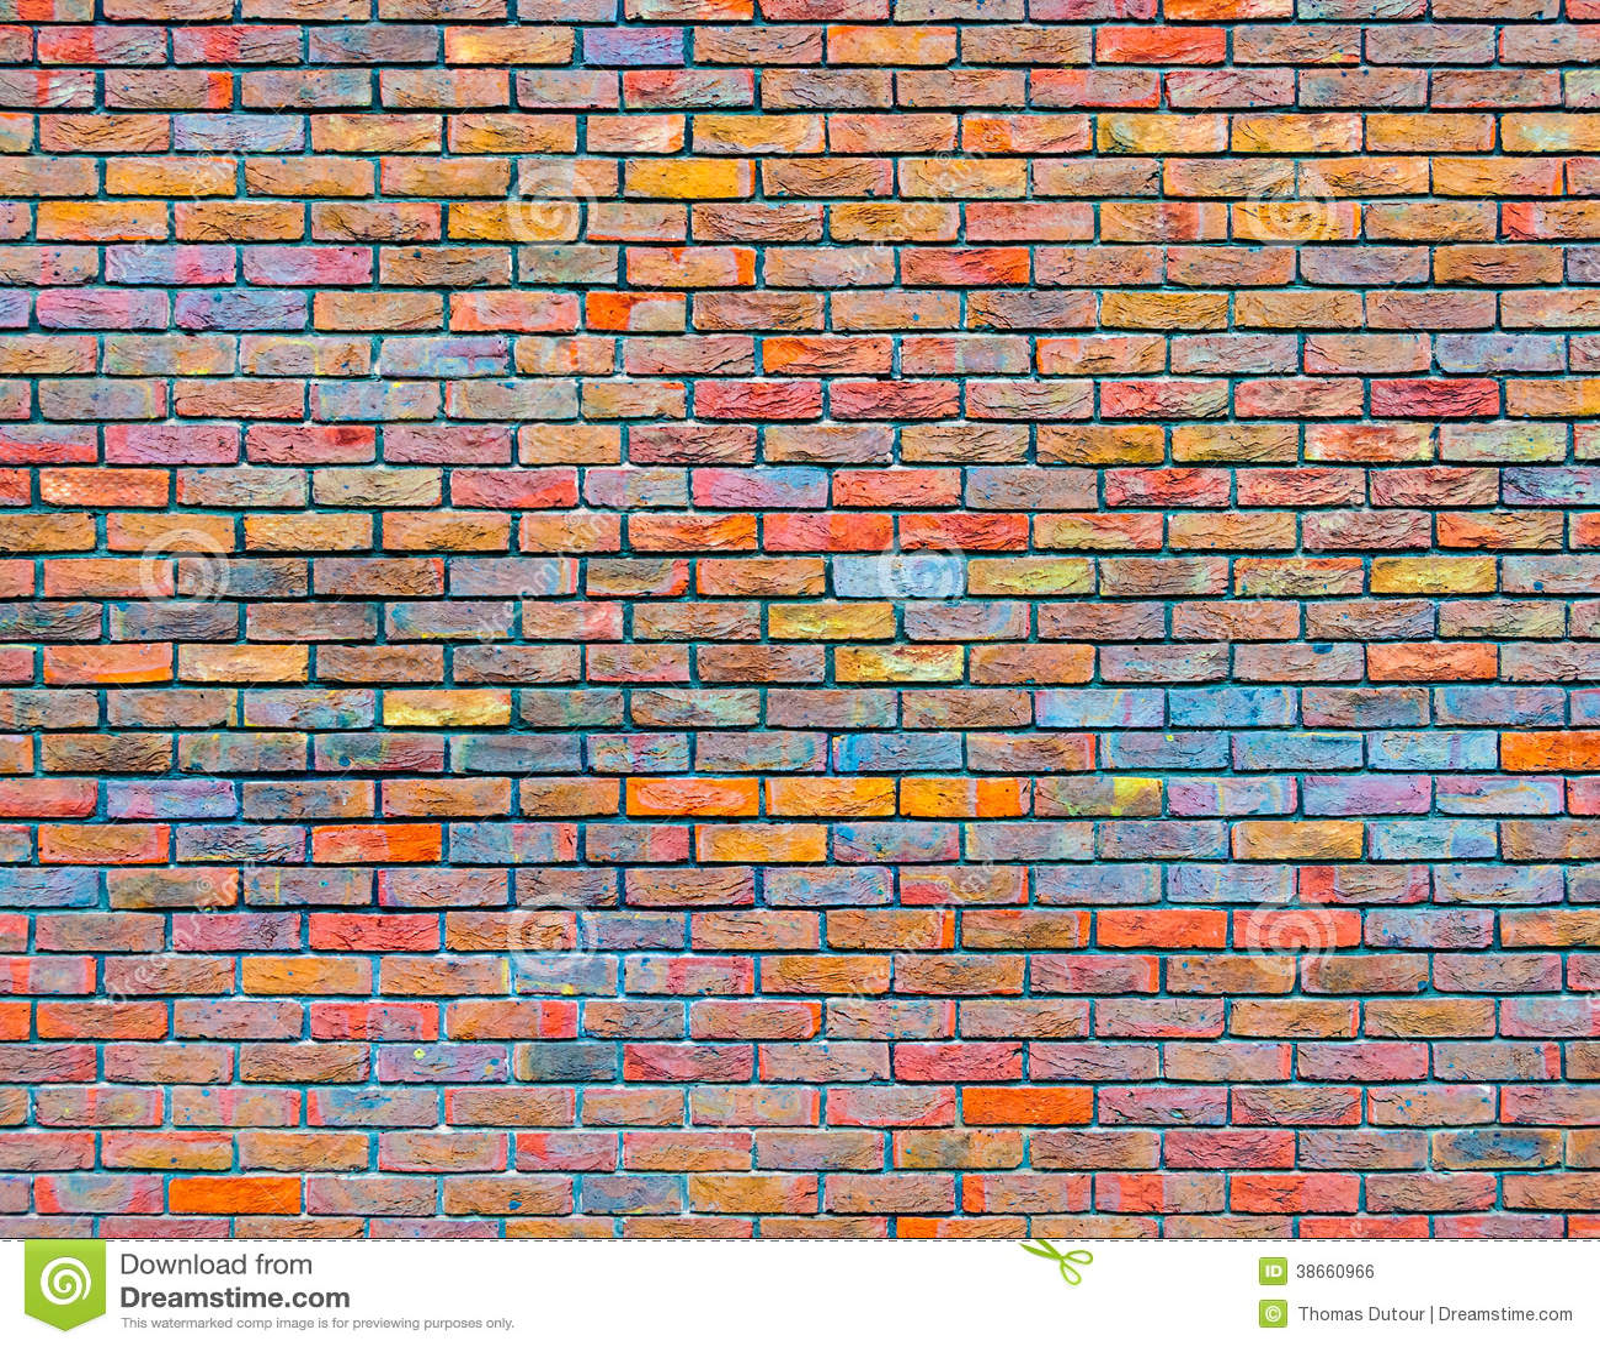 Colorful Brick Wall Texture Royalty Free Stock Image